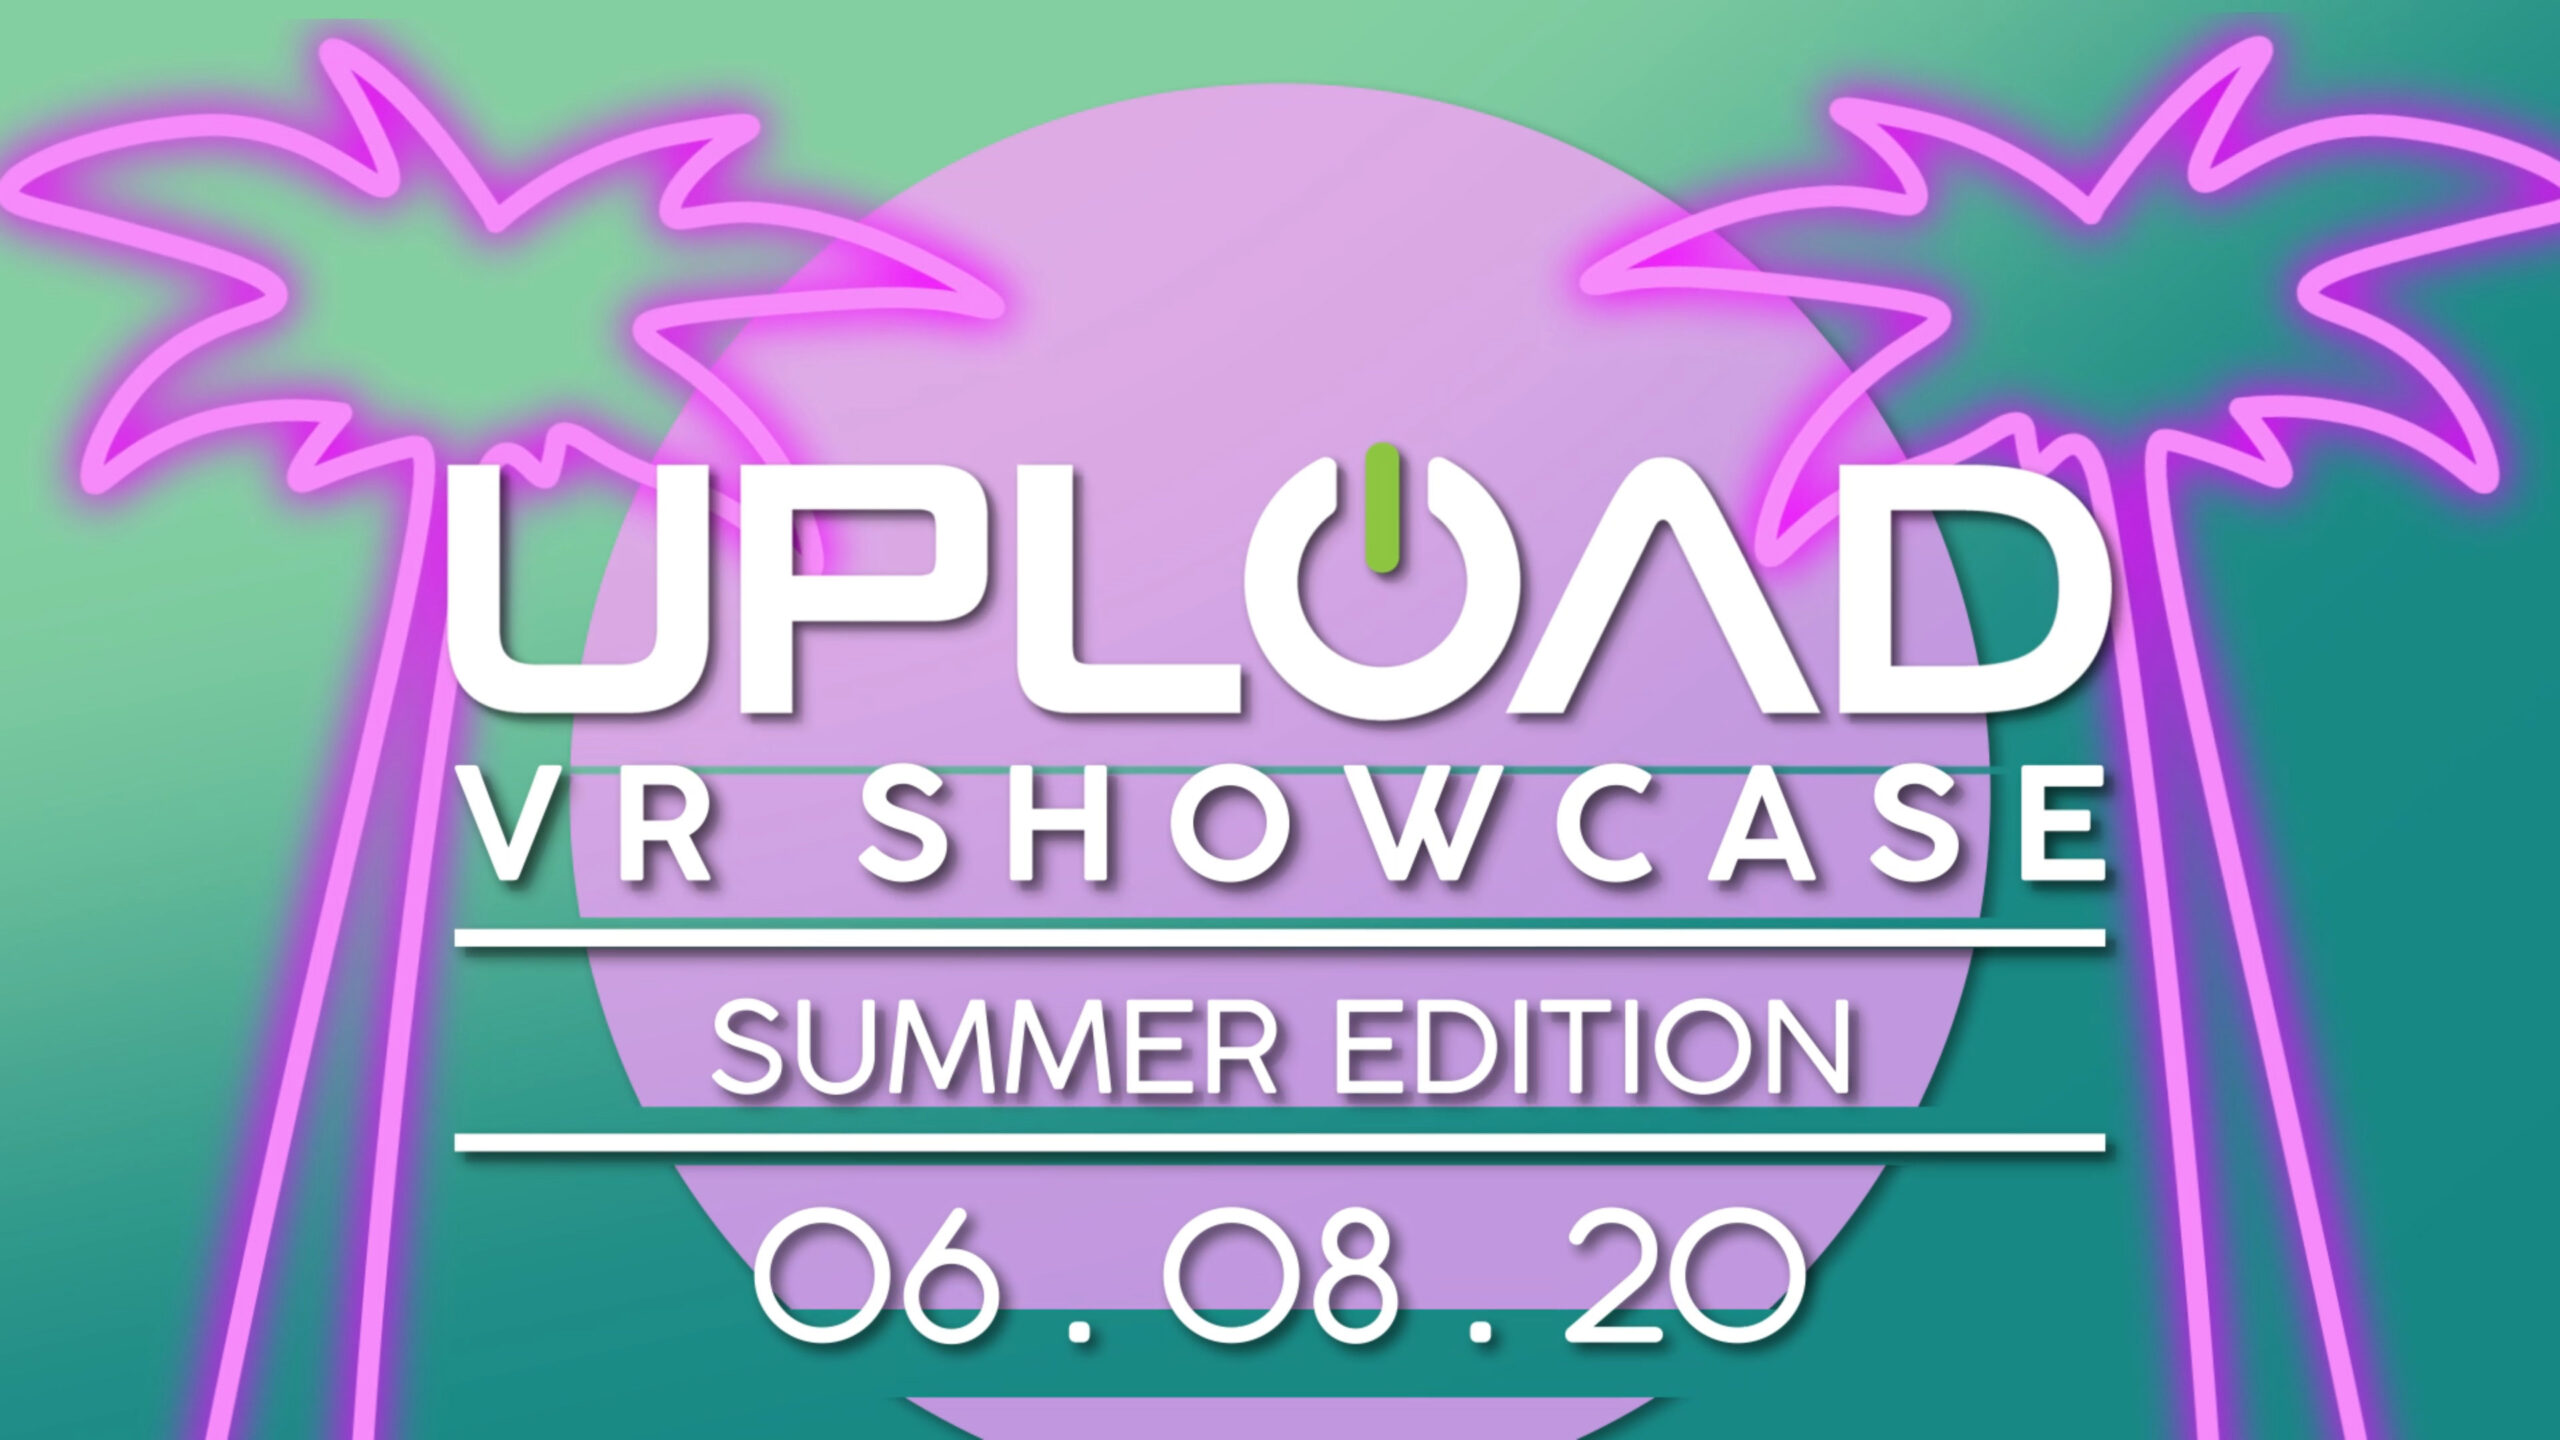 Upload VR Showcase 2020: Summer Edition